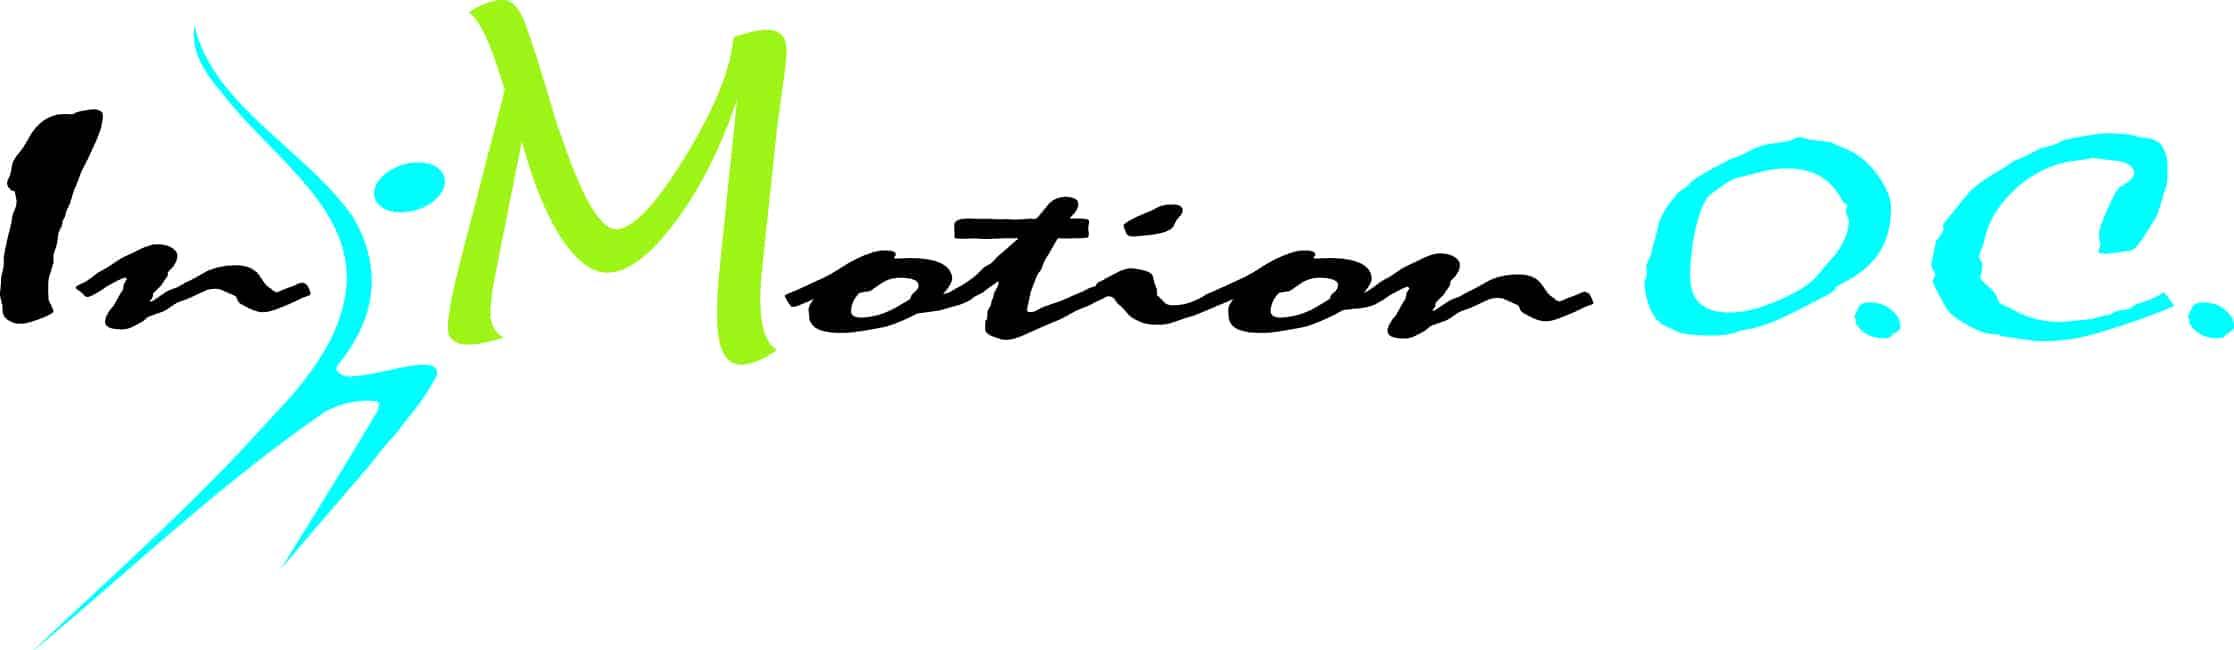 In Motion O.C. - Jeff Thomas